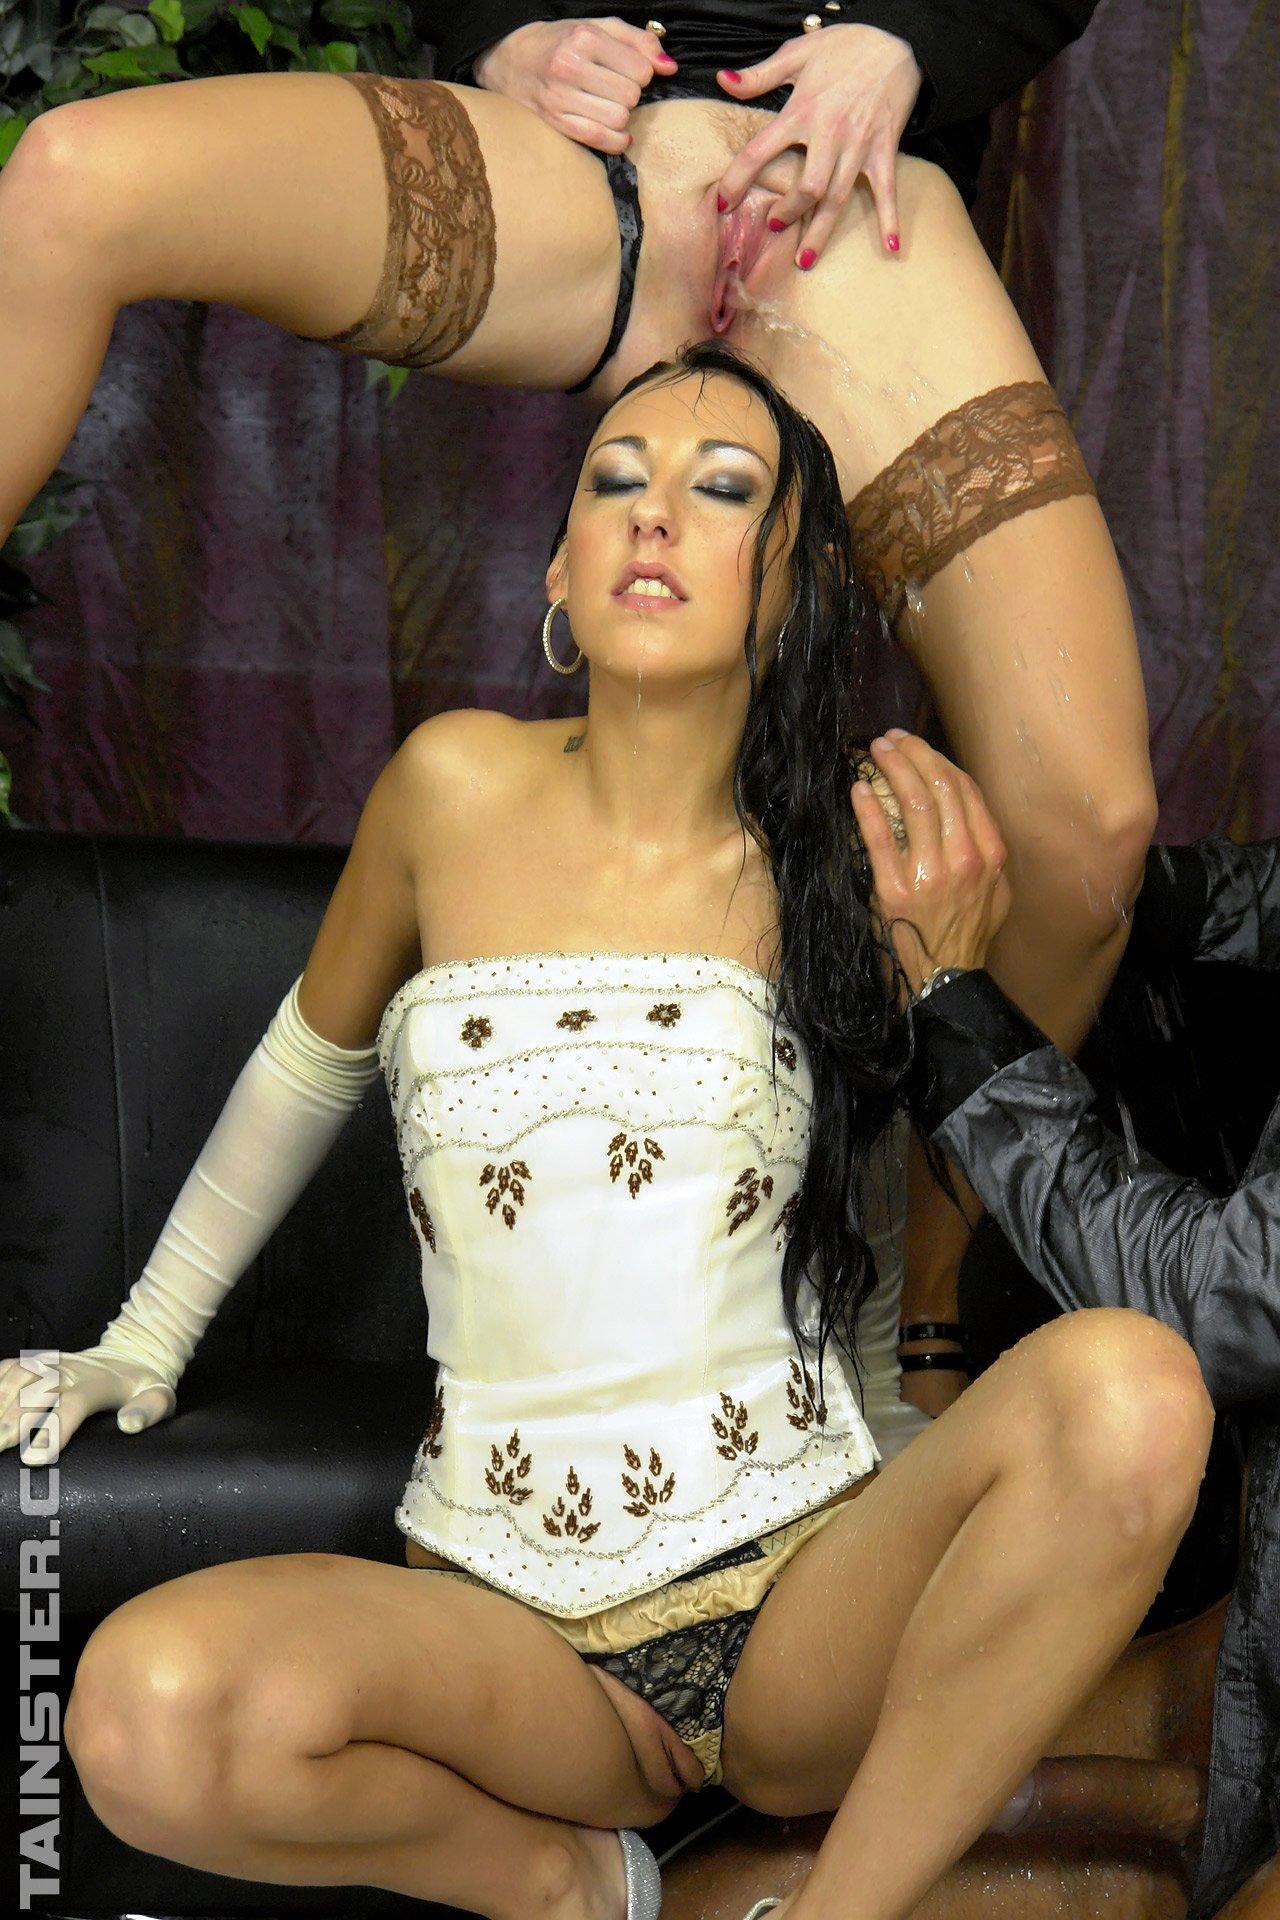 Секс в одежде - Фото галерея 920734